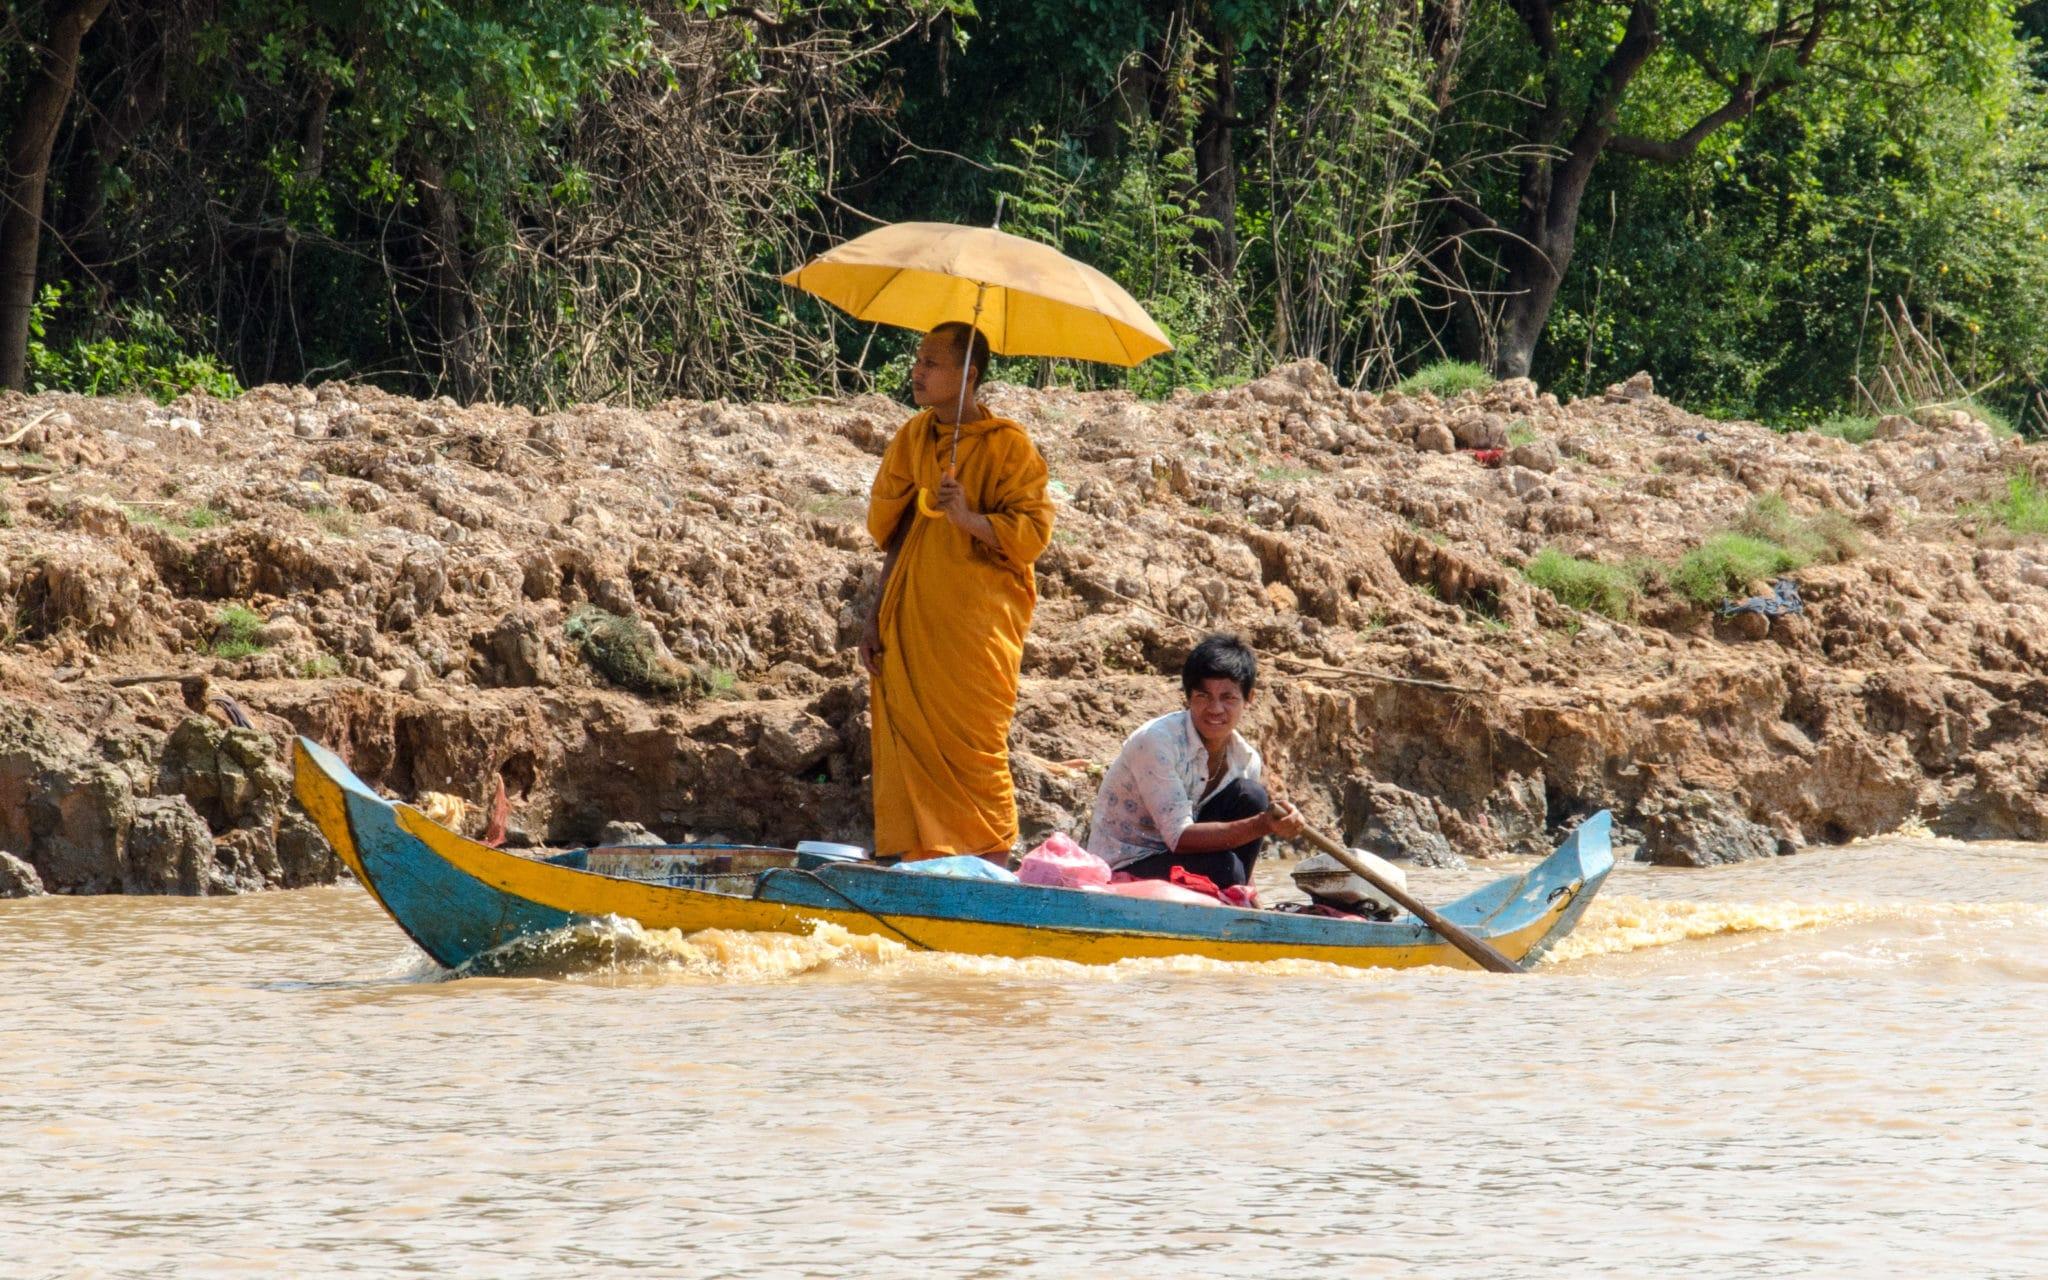 Monk in the Floating Village of Kompong Phluk